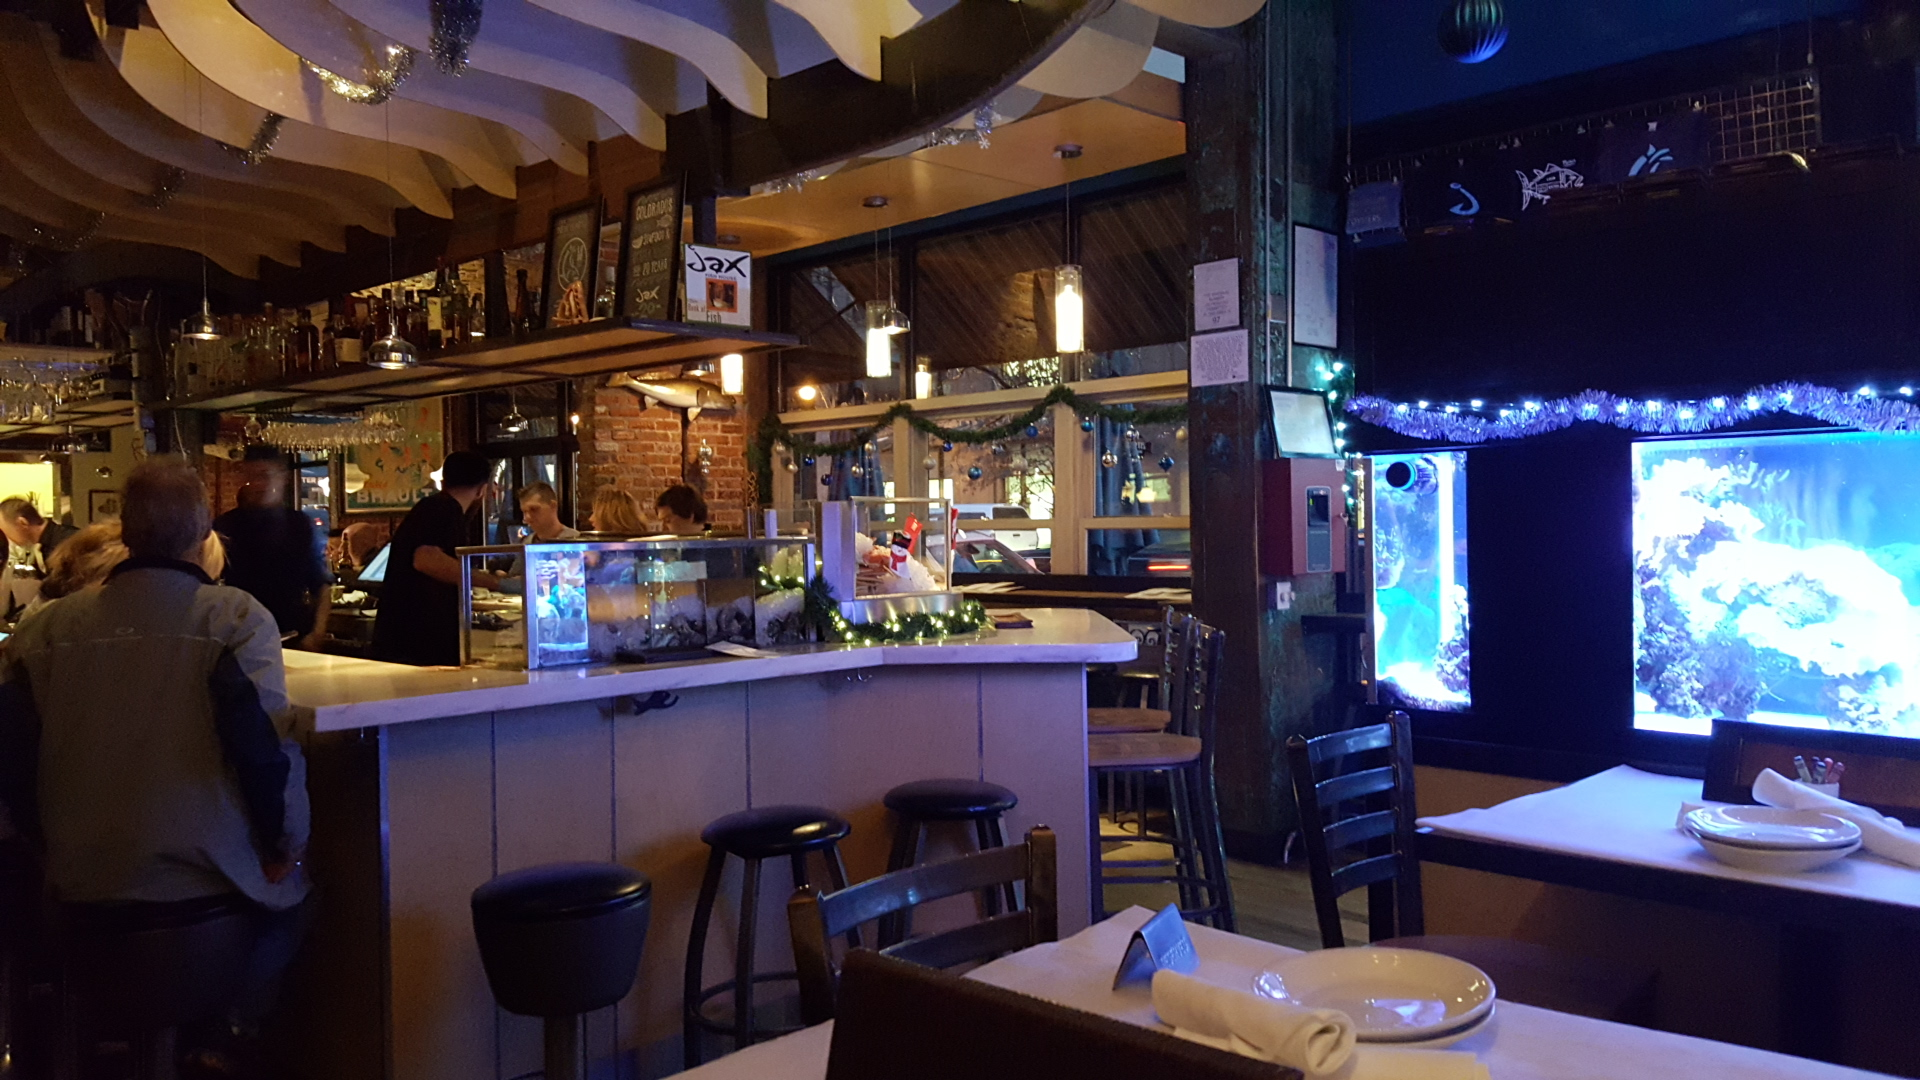 Jax Fish House Oyster Bar LoDo Denver